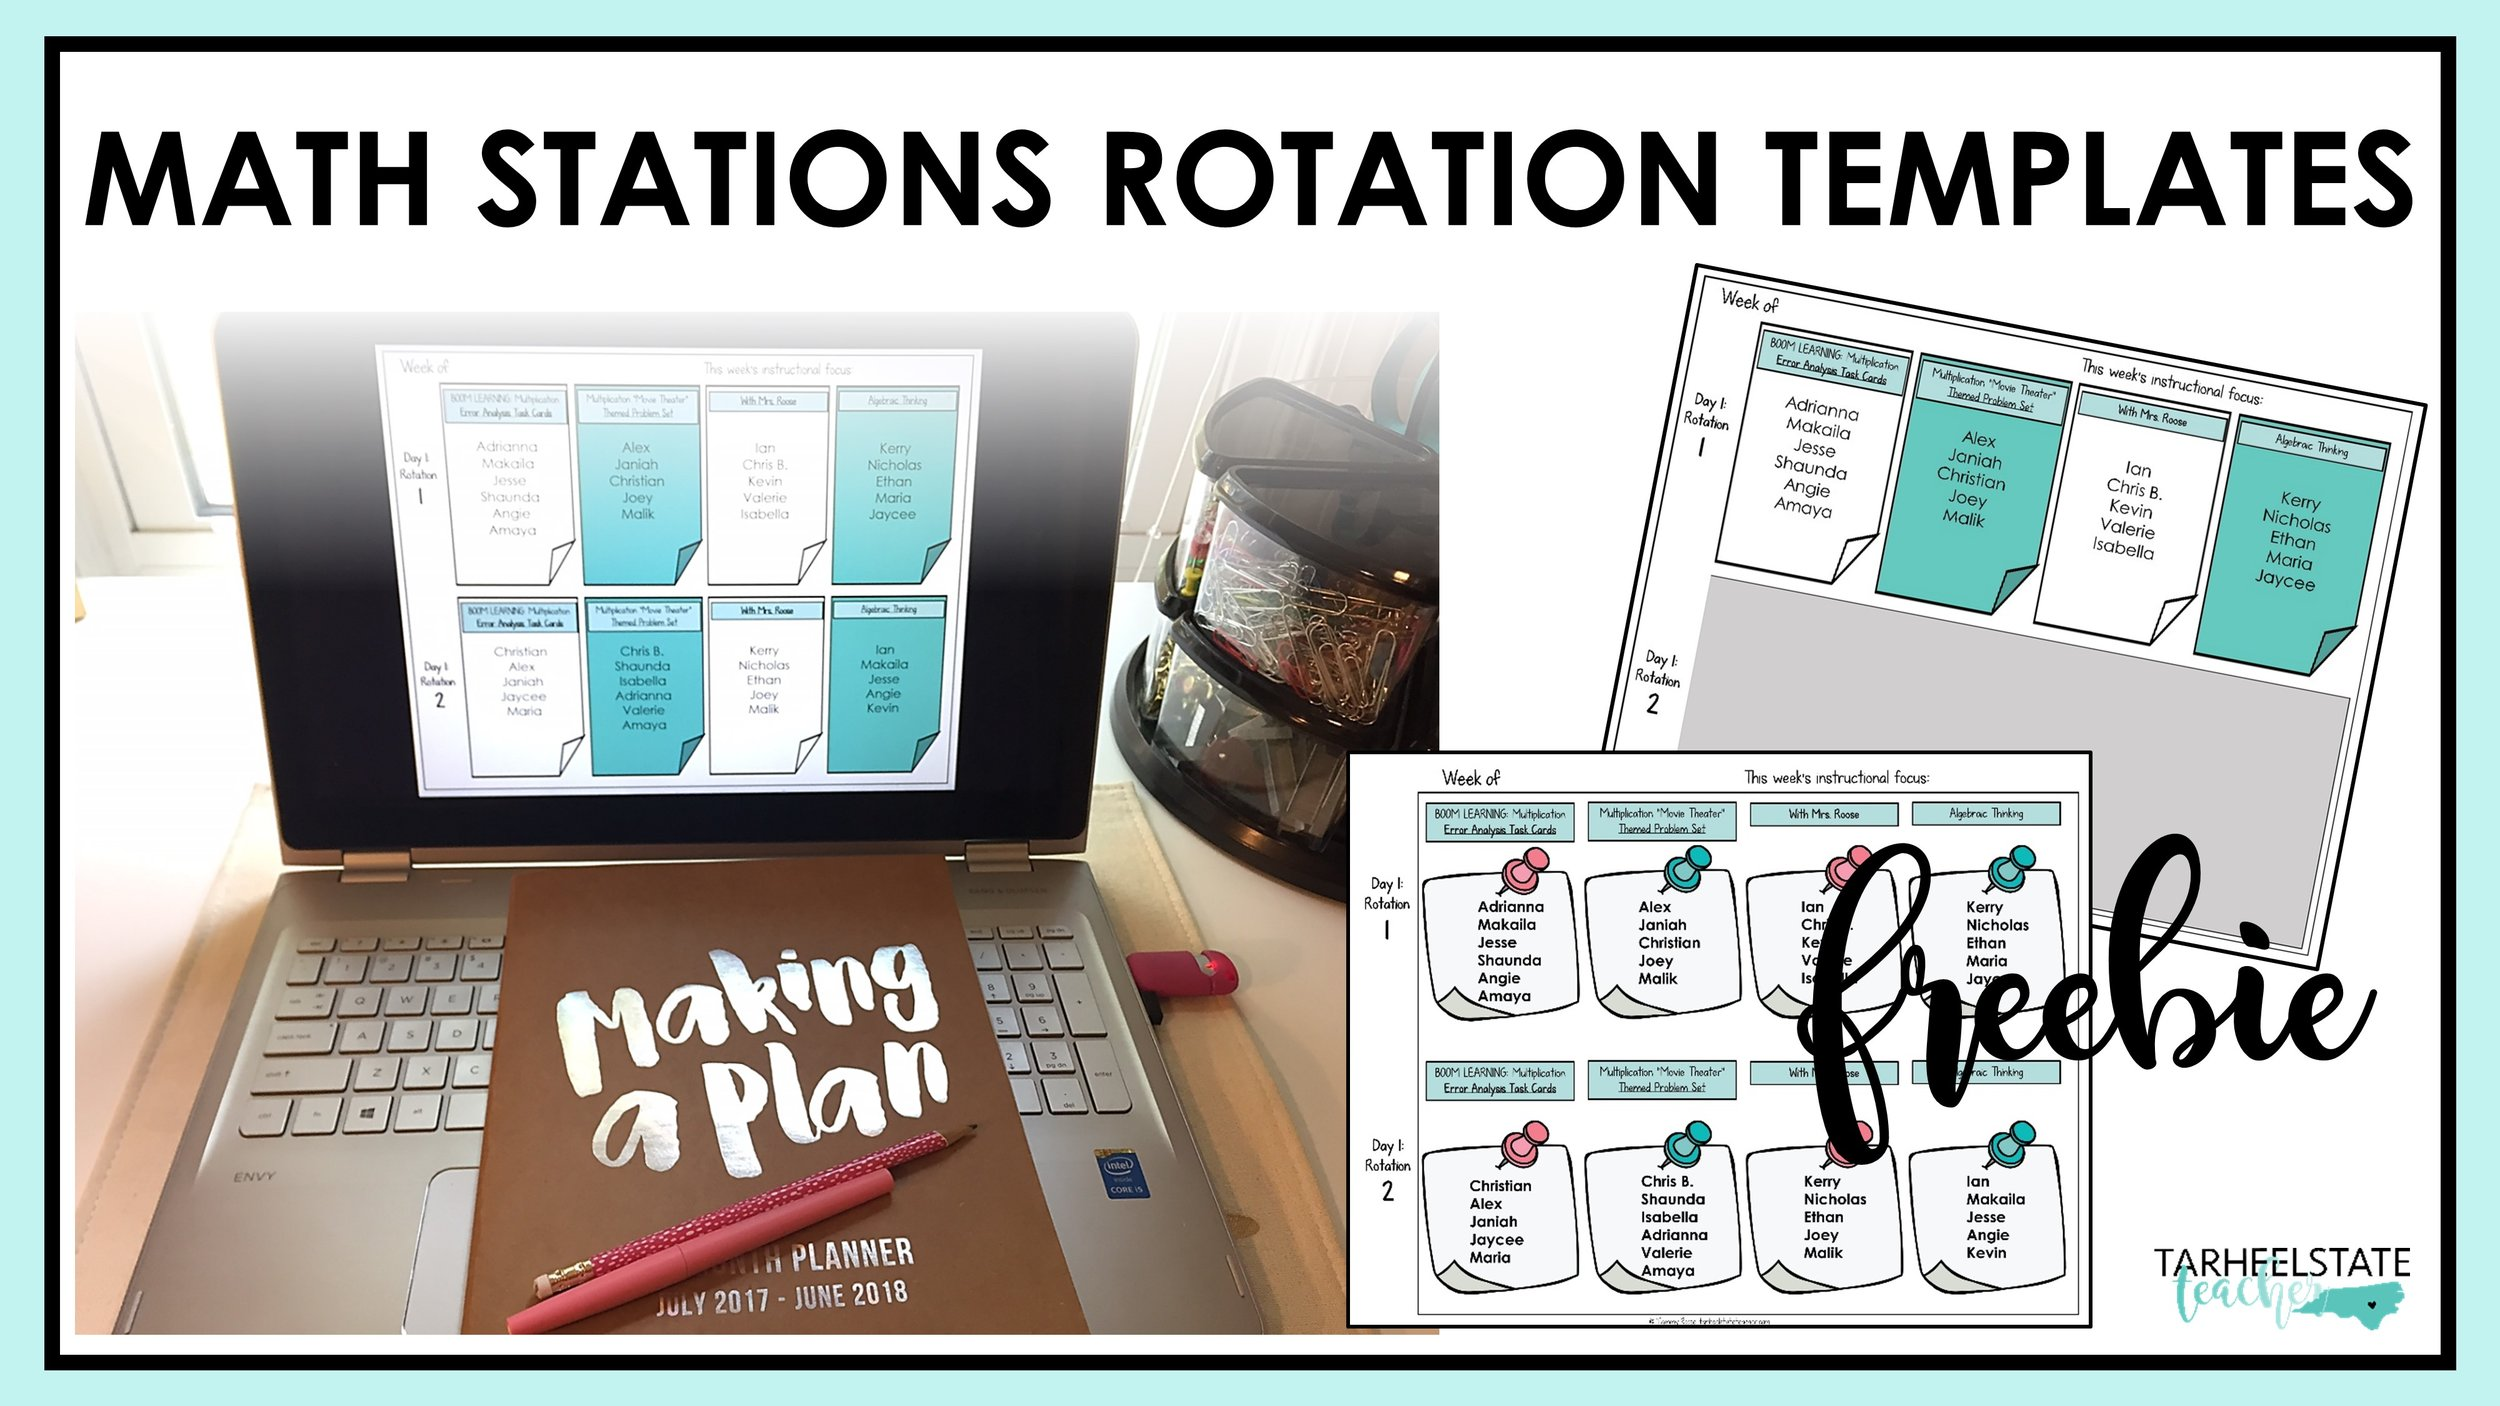 Math station rotation templates.JPG